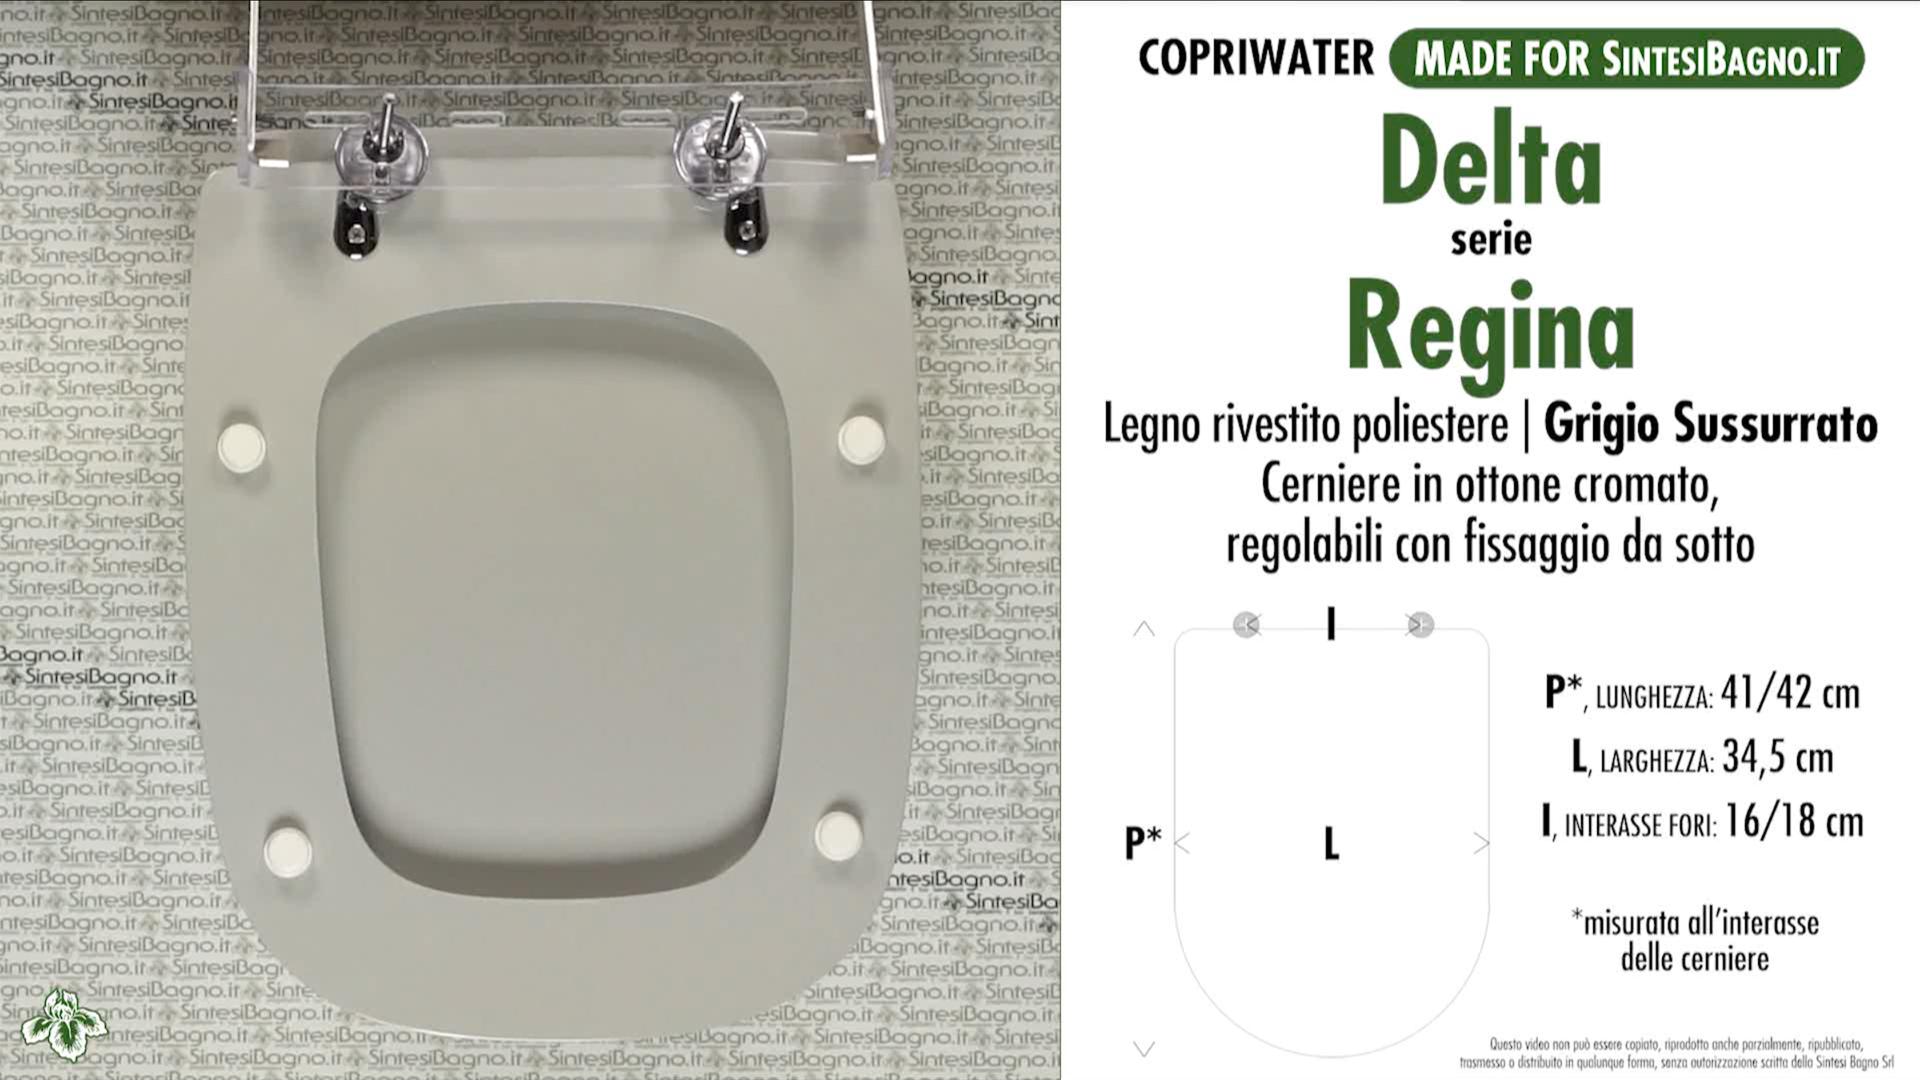 SCHEDA TECNICA MISURE copriwater DELTA REGINA